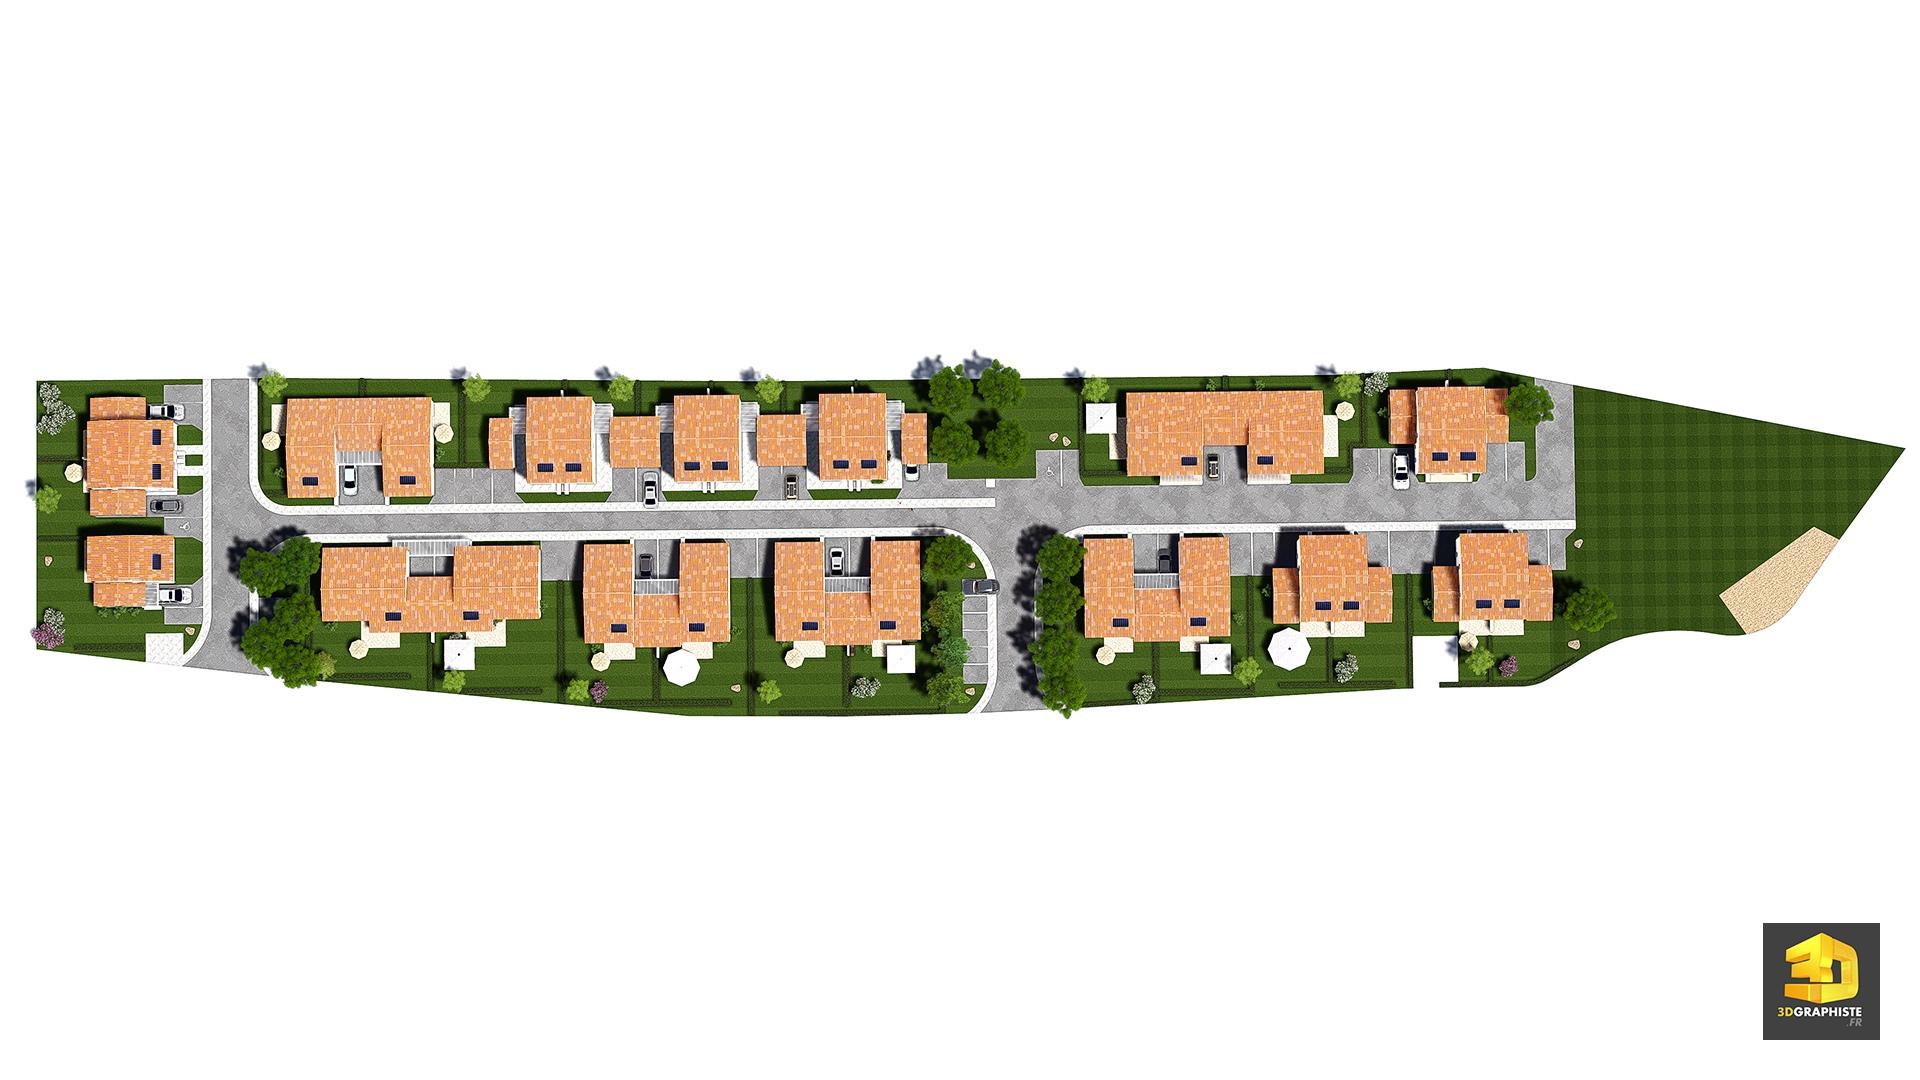 Résidence plan de masse idélia saubens résidence plan de masse idélia saubens résidence constituée de 27 villas en bande